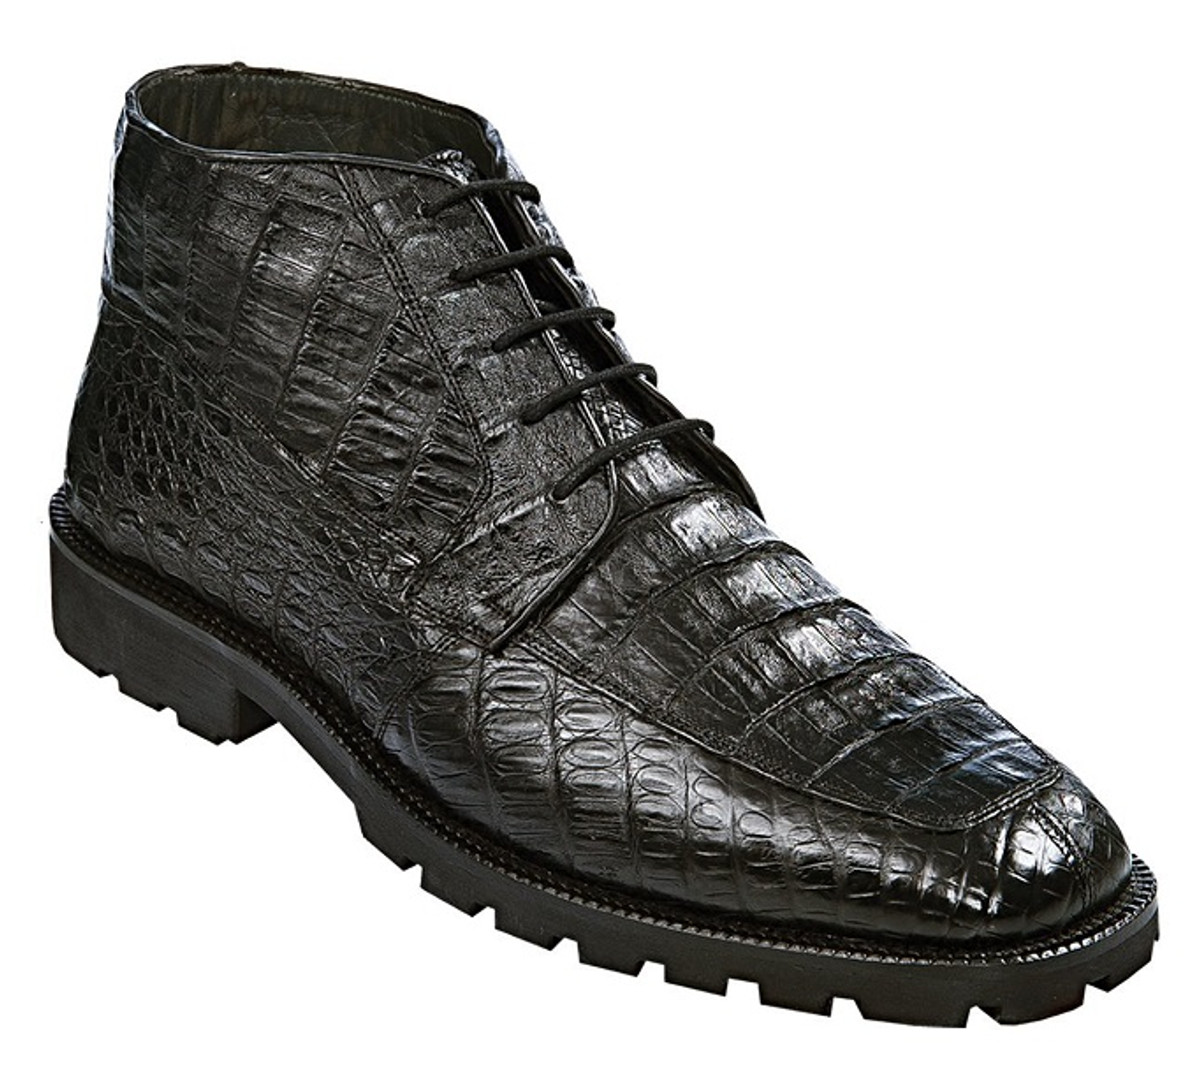 a6931bfea0d Los Altos Mens Black Crocodile Chukka Boot ZA2060205